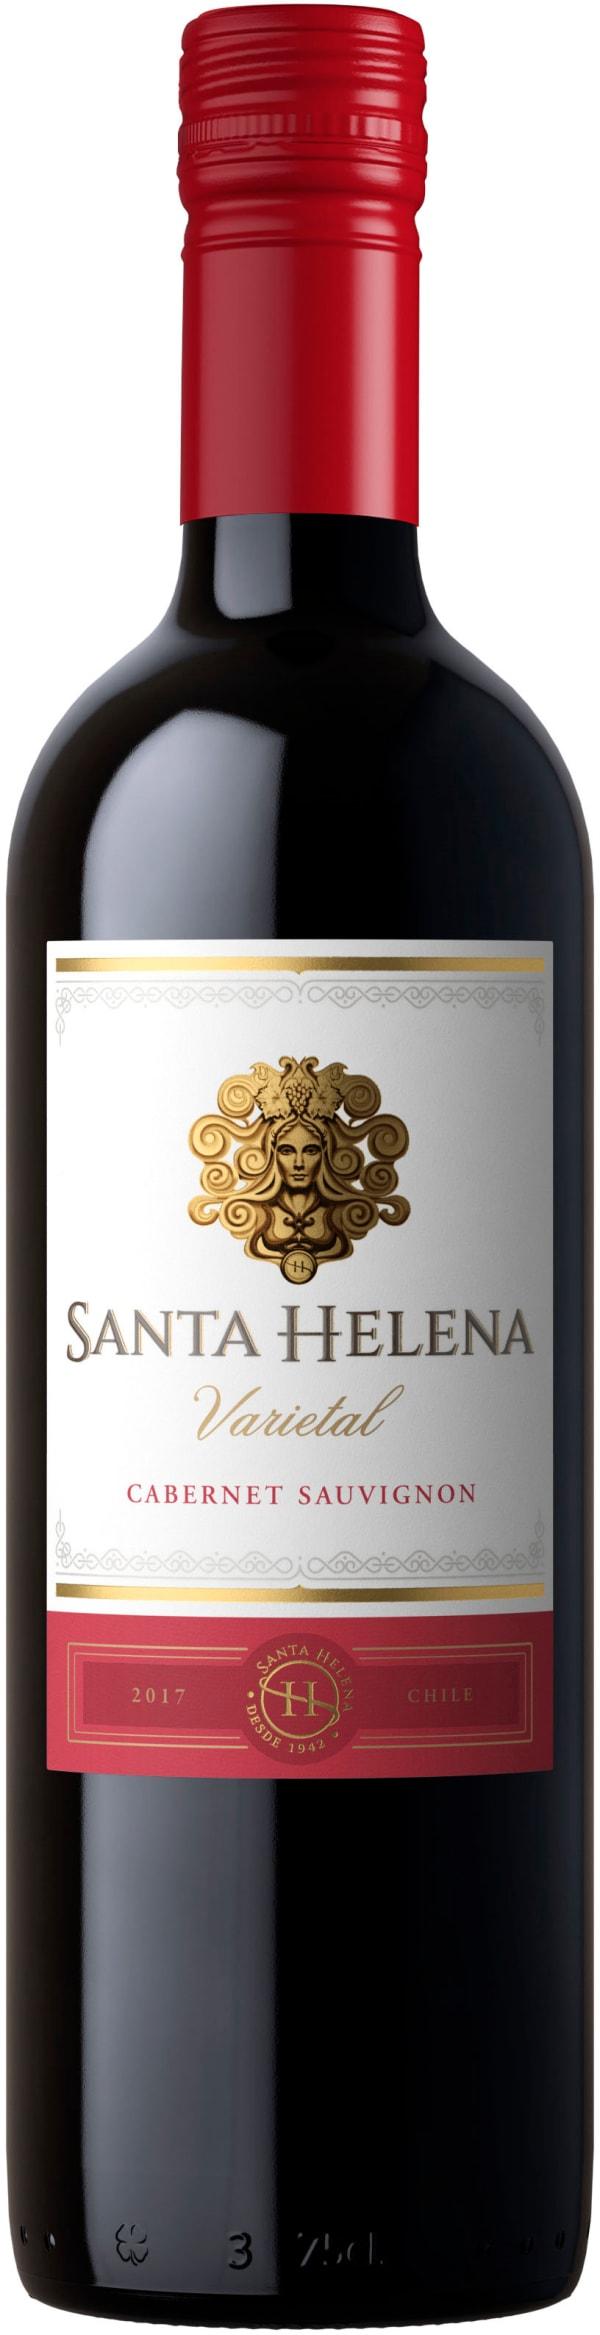 Santa Helena Varietal Cabernet Sauvignon 2020